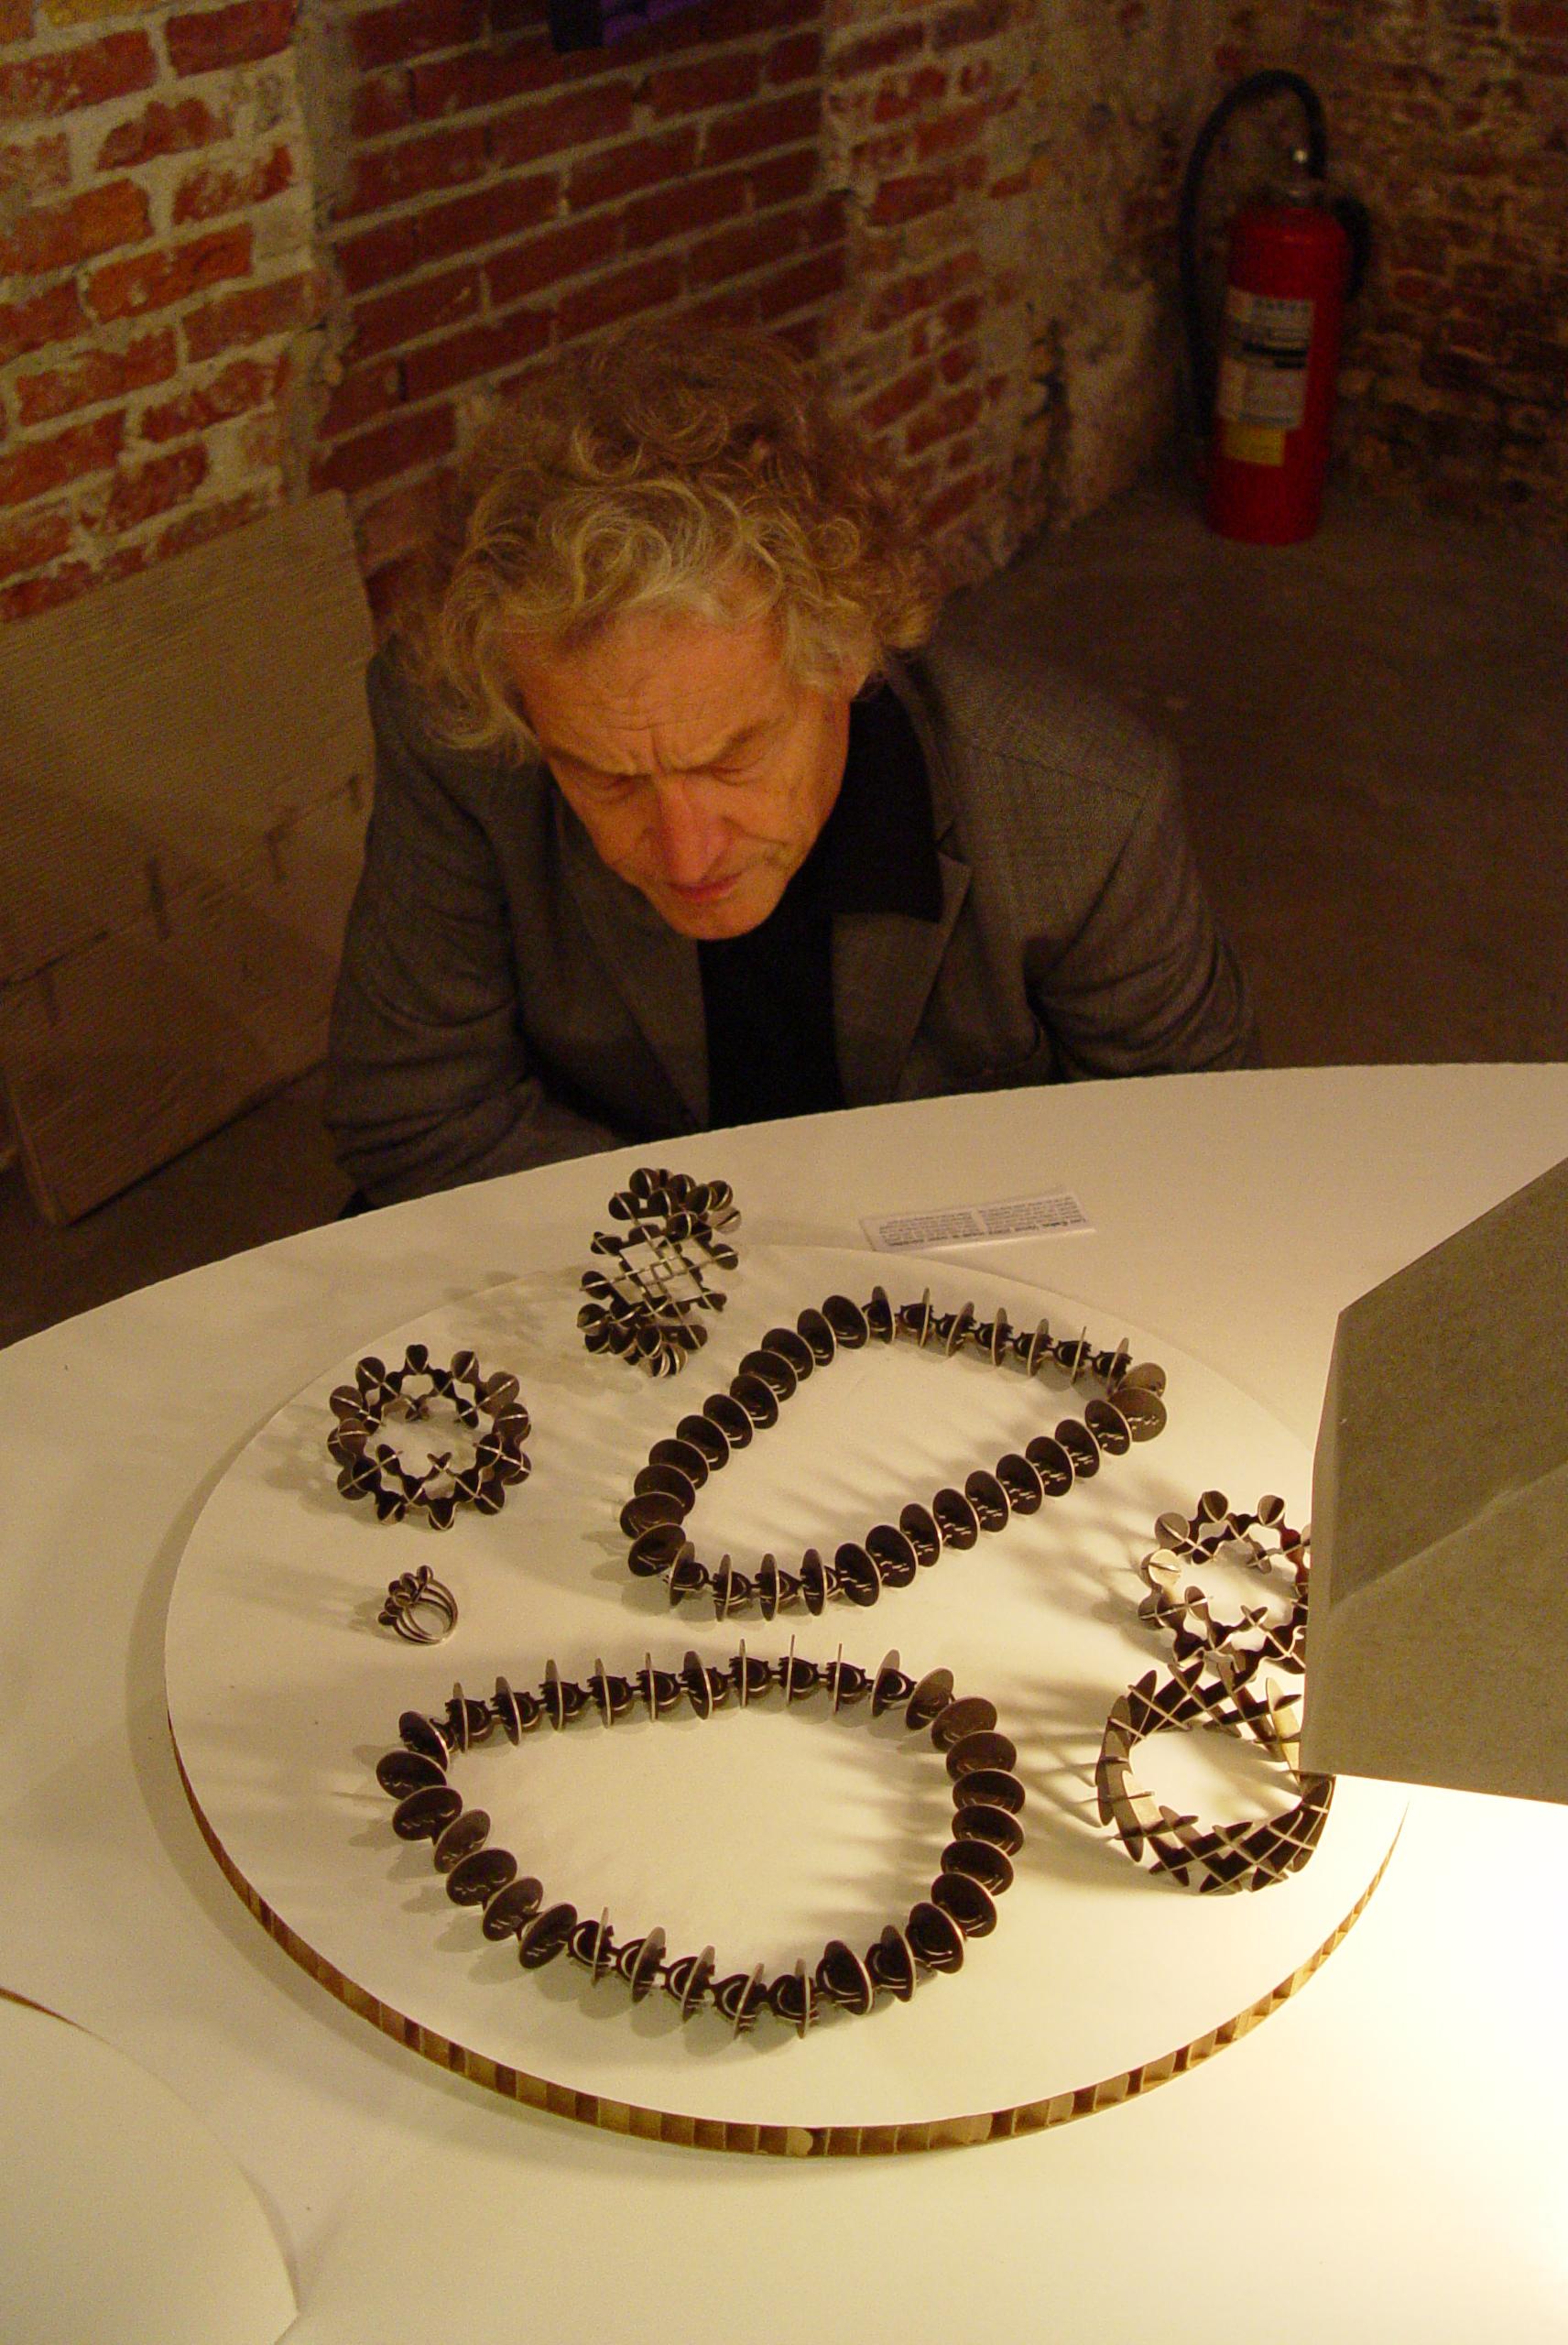 Leo Cahn, sieraden, Beyond Material, portret Rudy Uytenhaak, armbanden, halssieraden, ring, broche, tentoonstelling, foto Birgit Laken